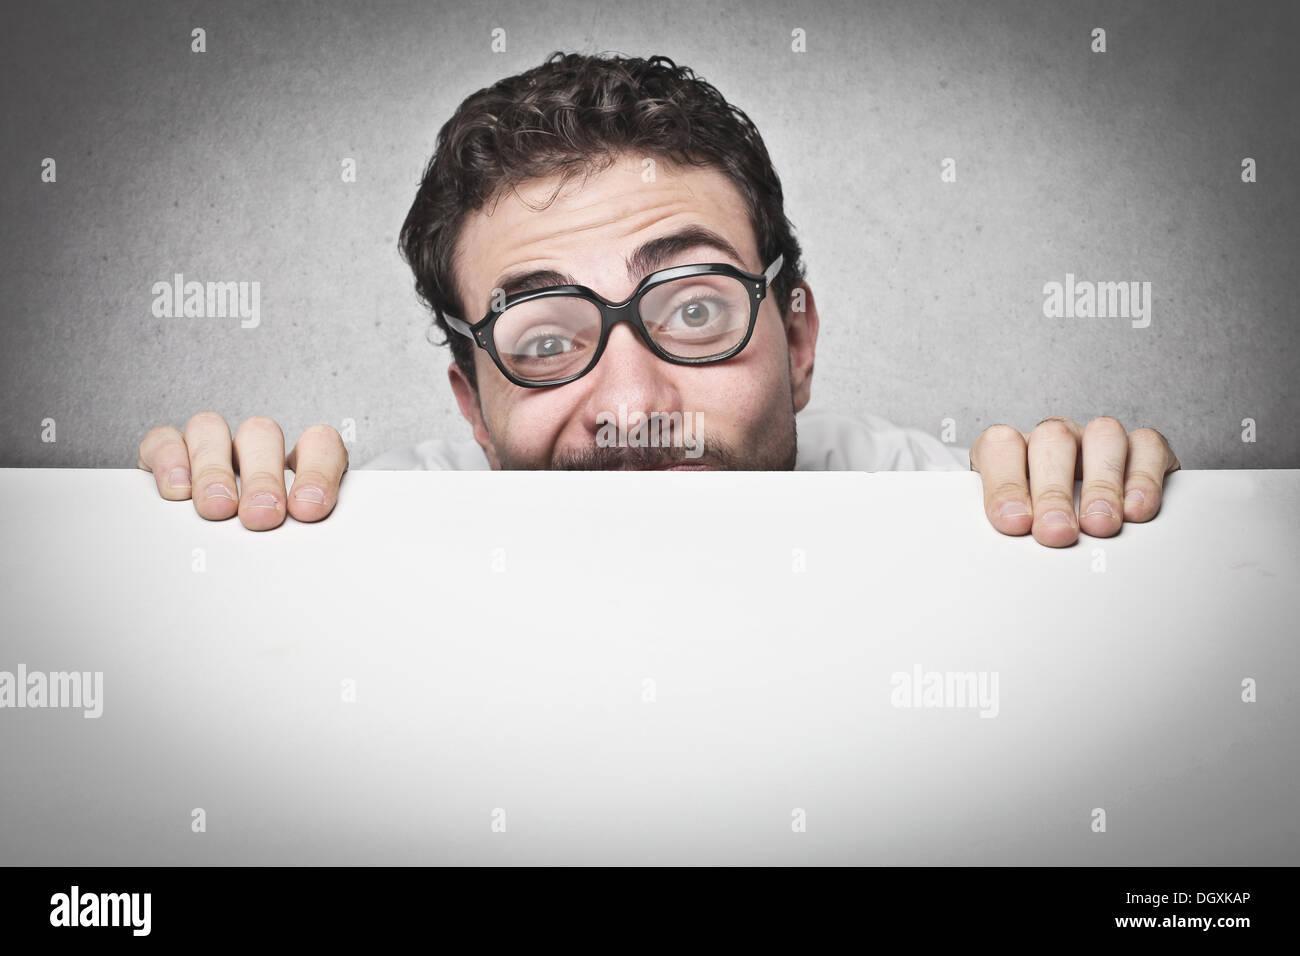 Mann hält einen leeren Karton Stockbild